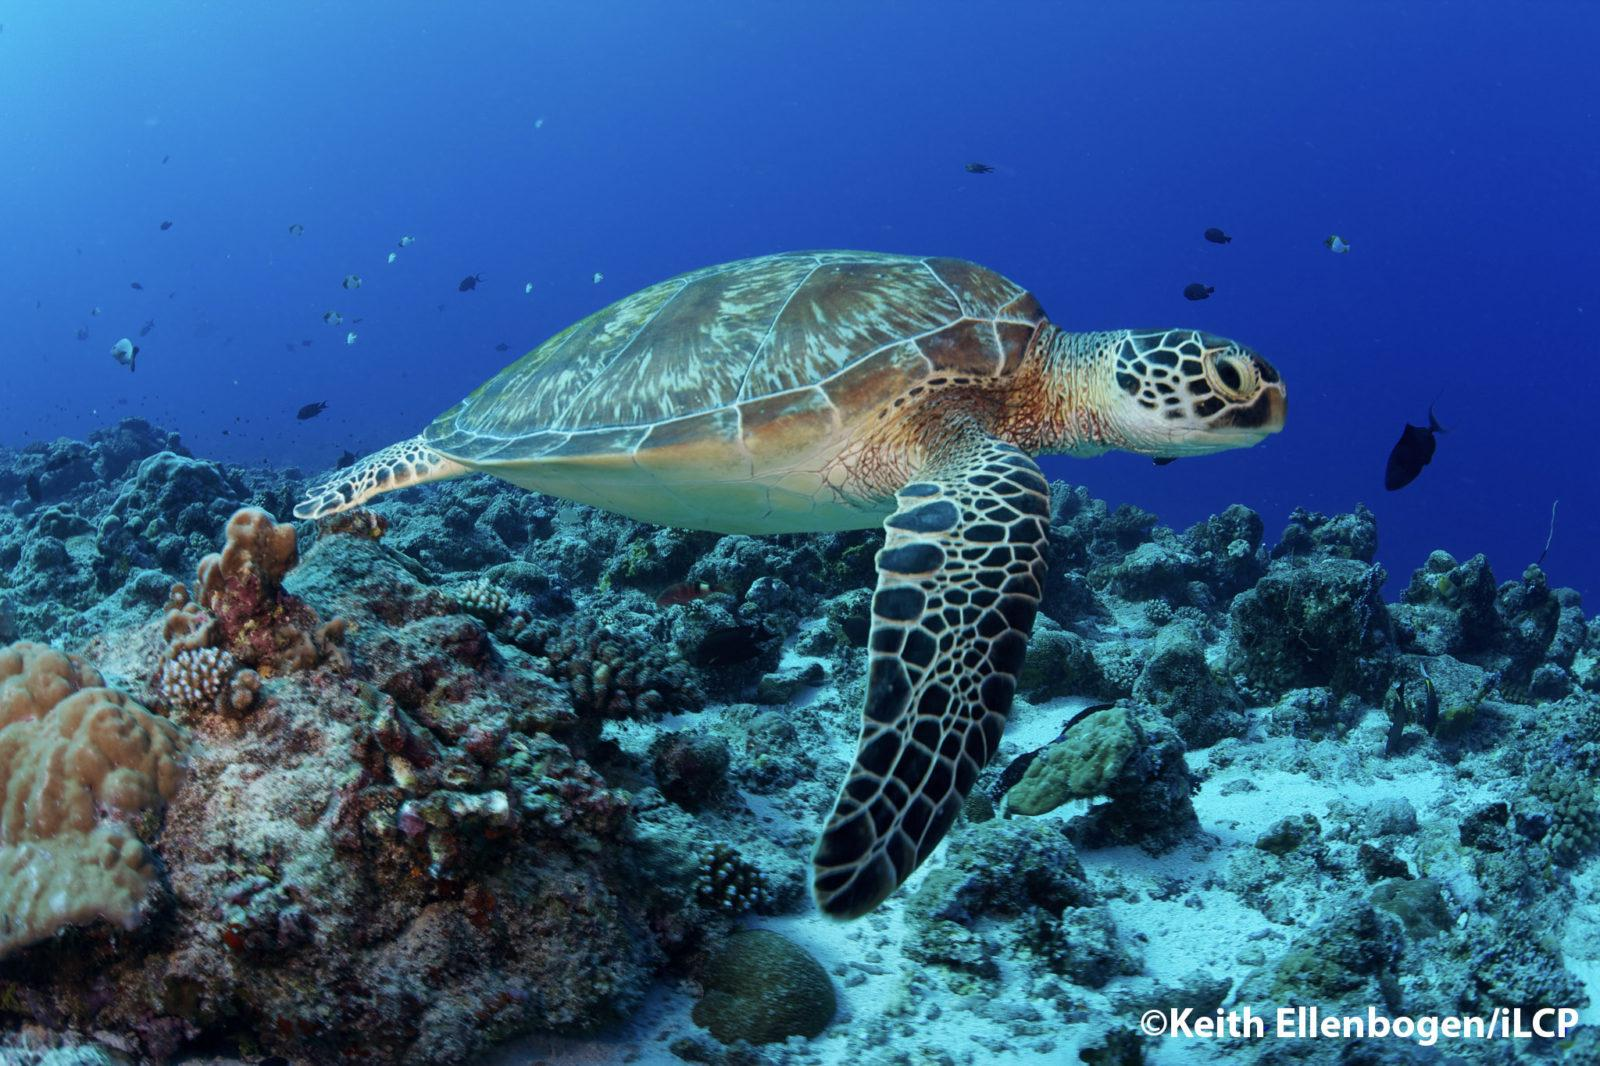 Palau a Jewel of the Ocean